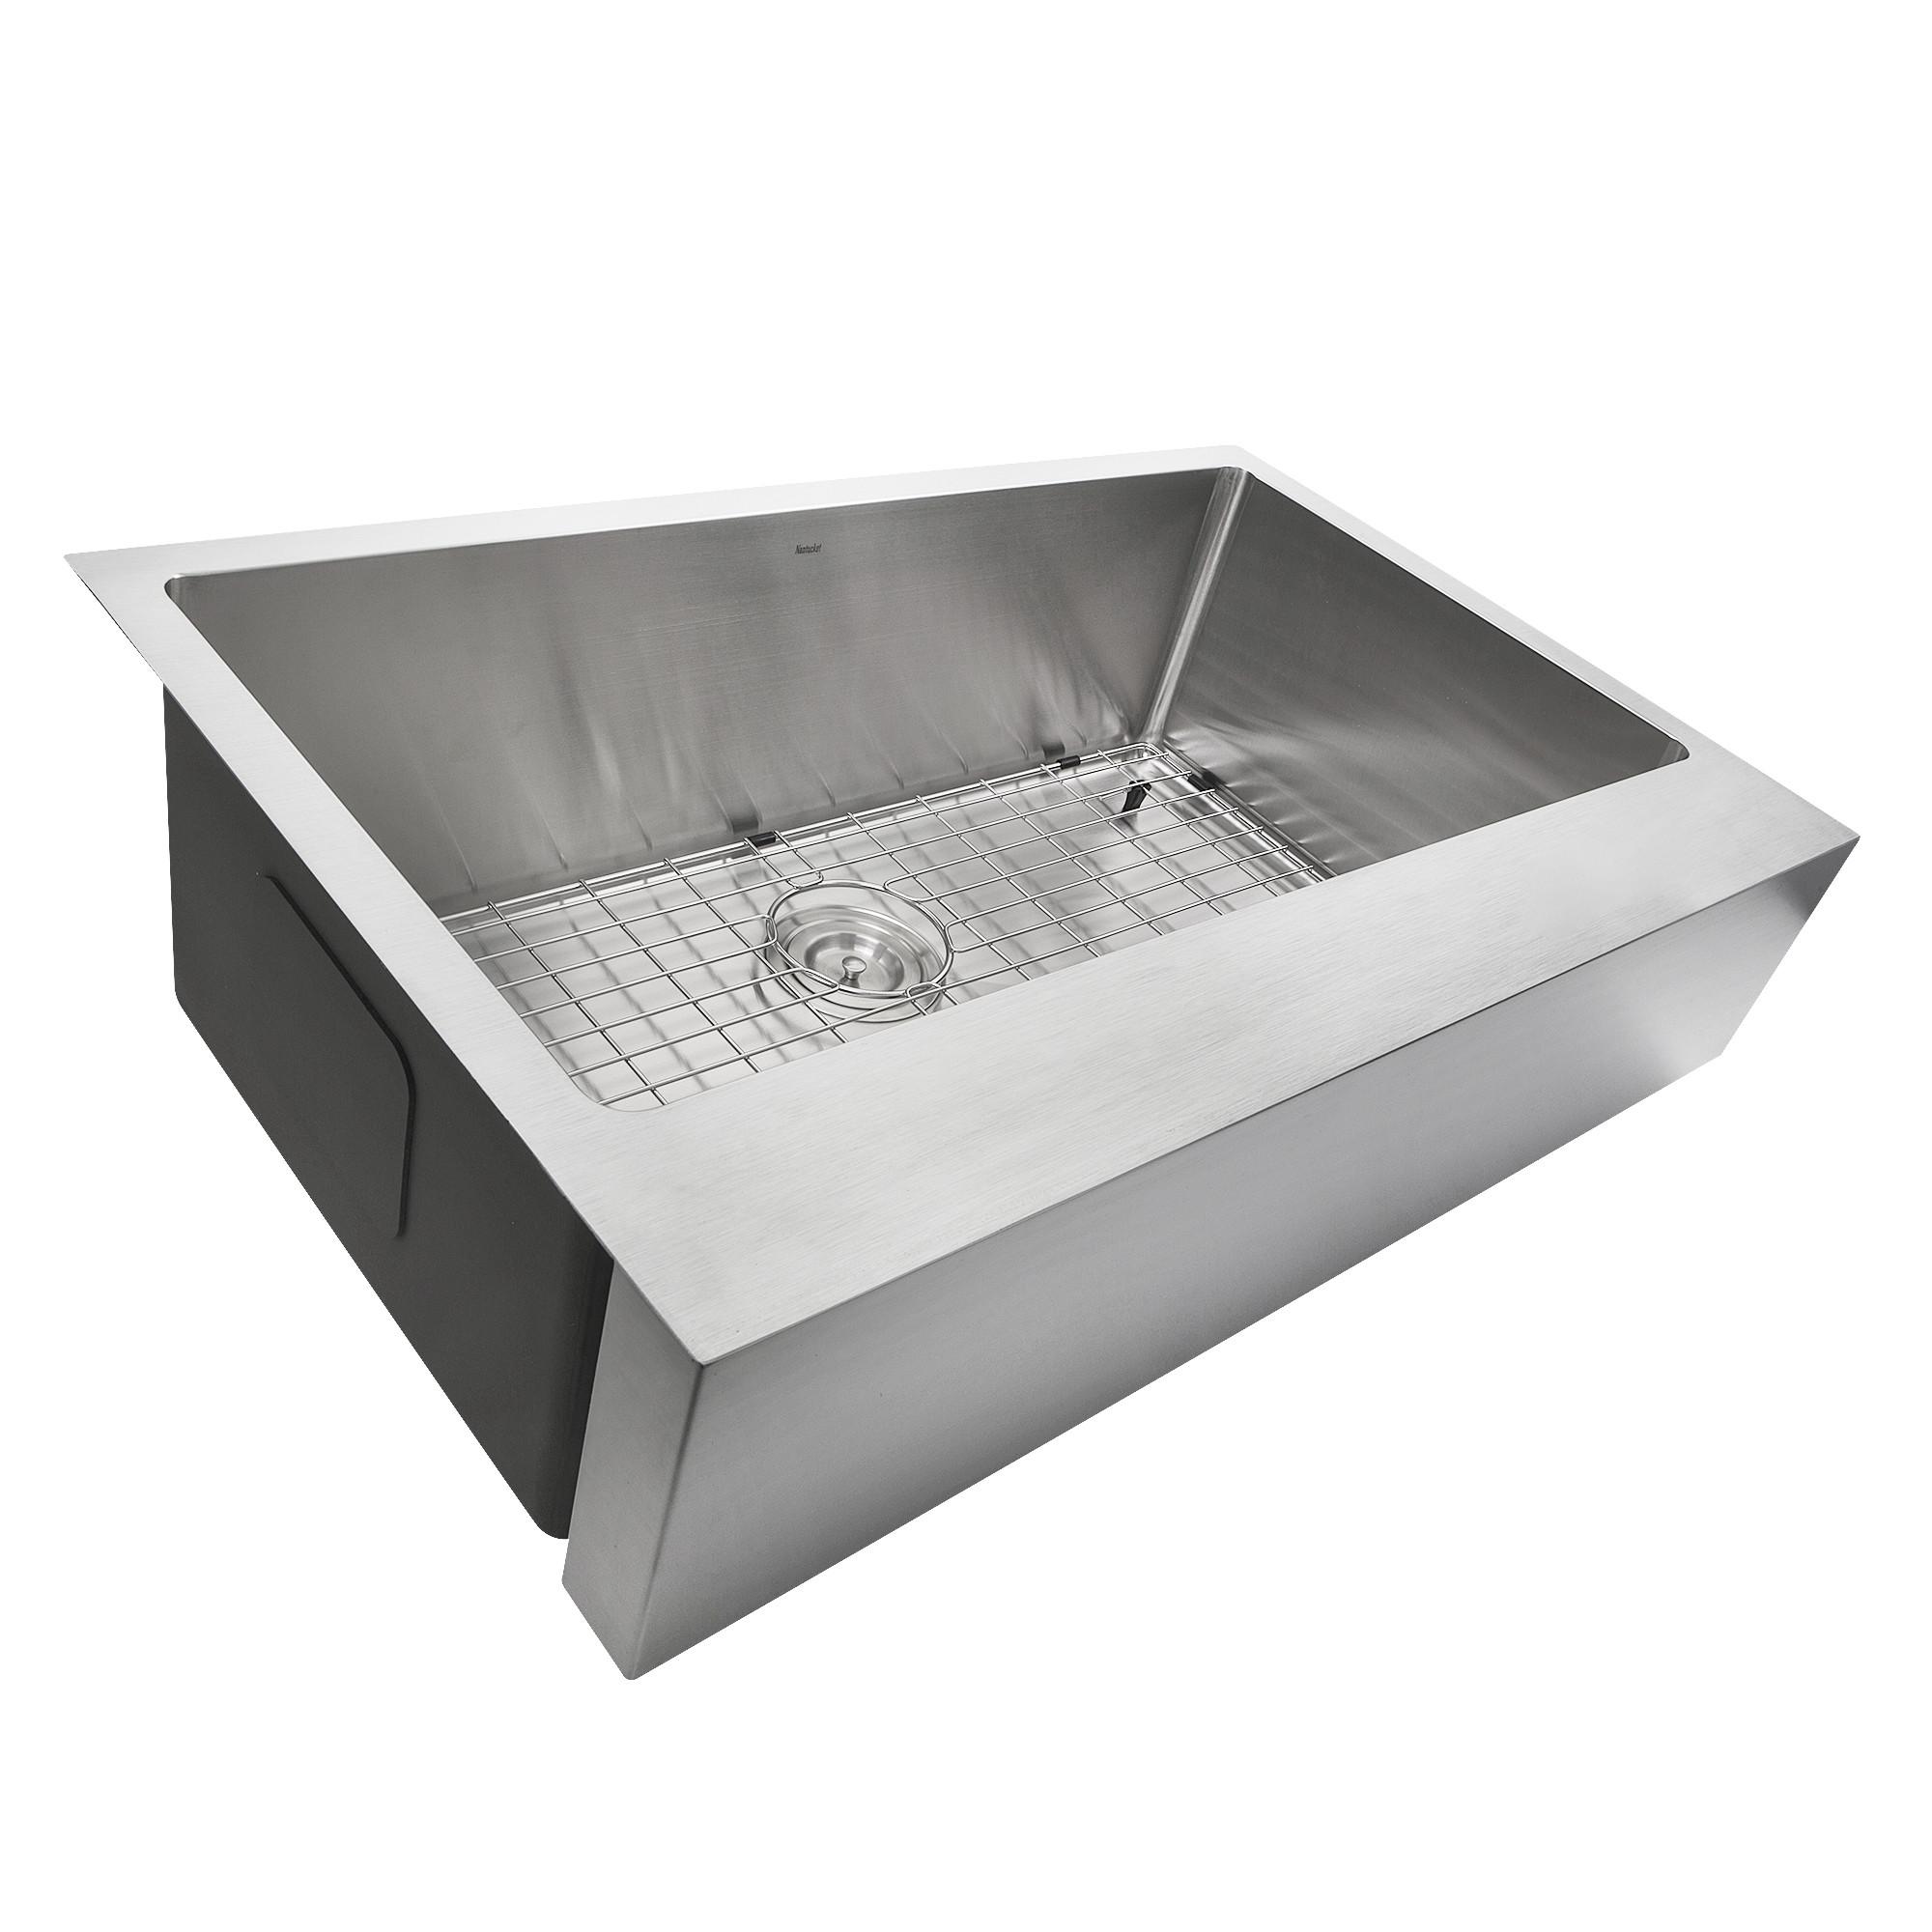 Nantucket EZApron33 Patented Design Pro Series Kitchen Sink w/ Apron Front